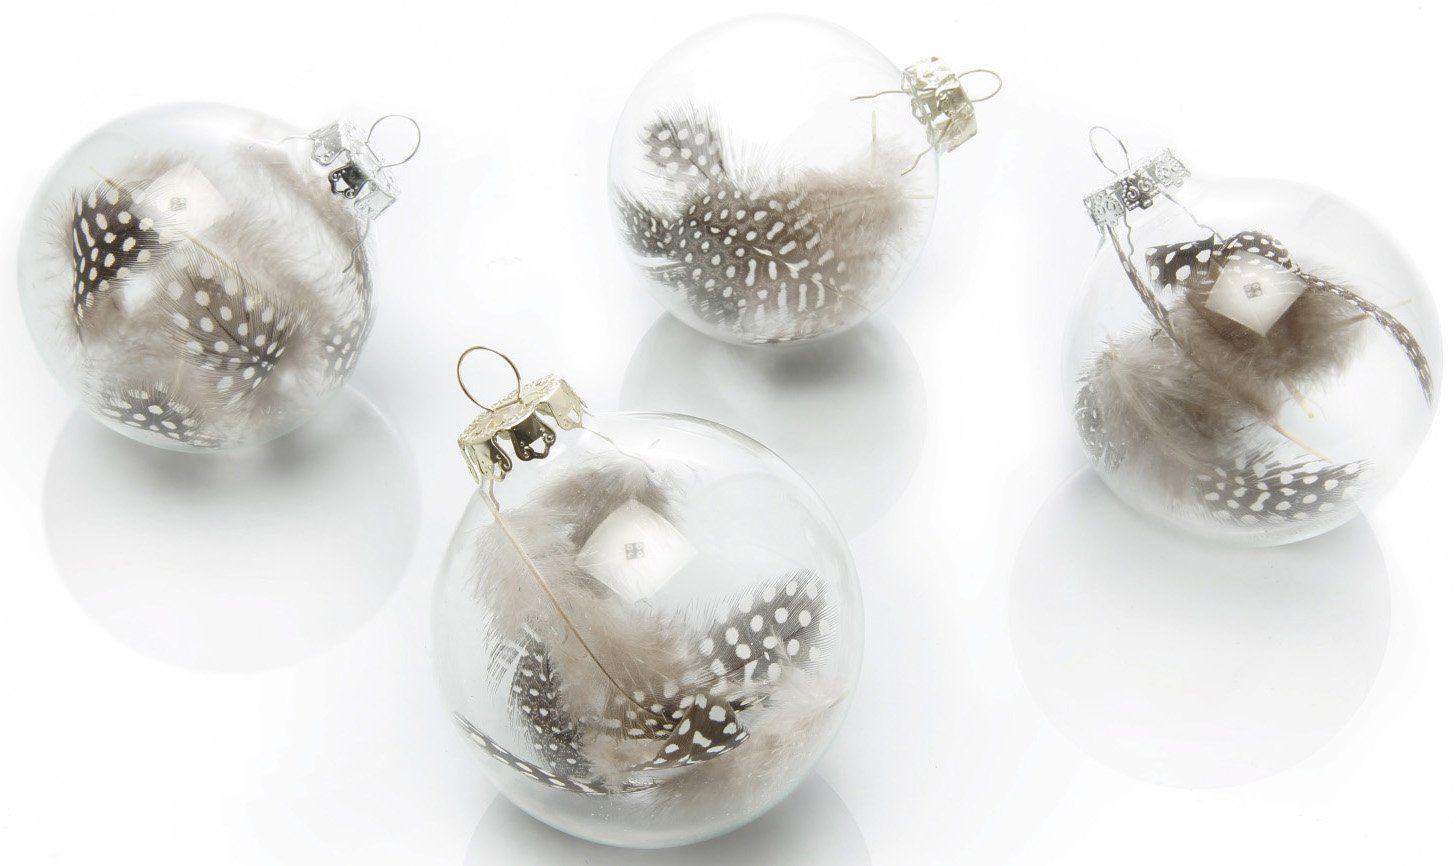 Thüringer Glasdesign TGS-Glaskugeln Transparent mit Vogelfeder (4-teilg)